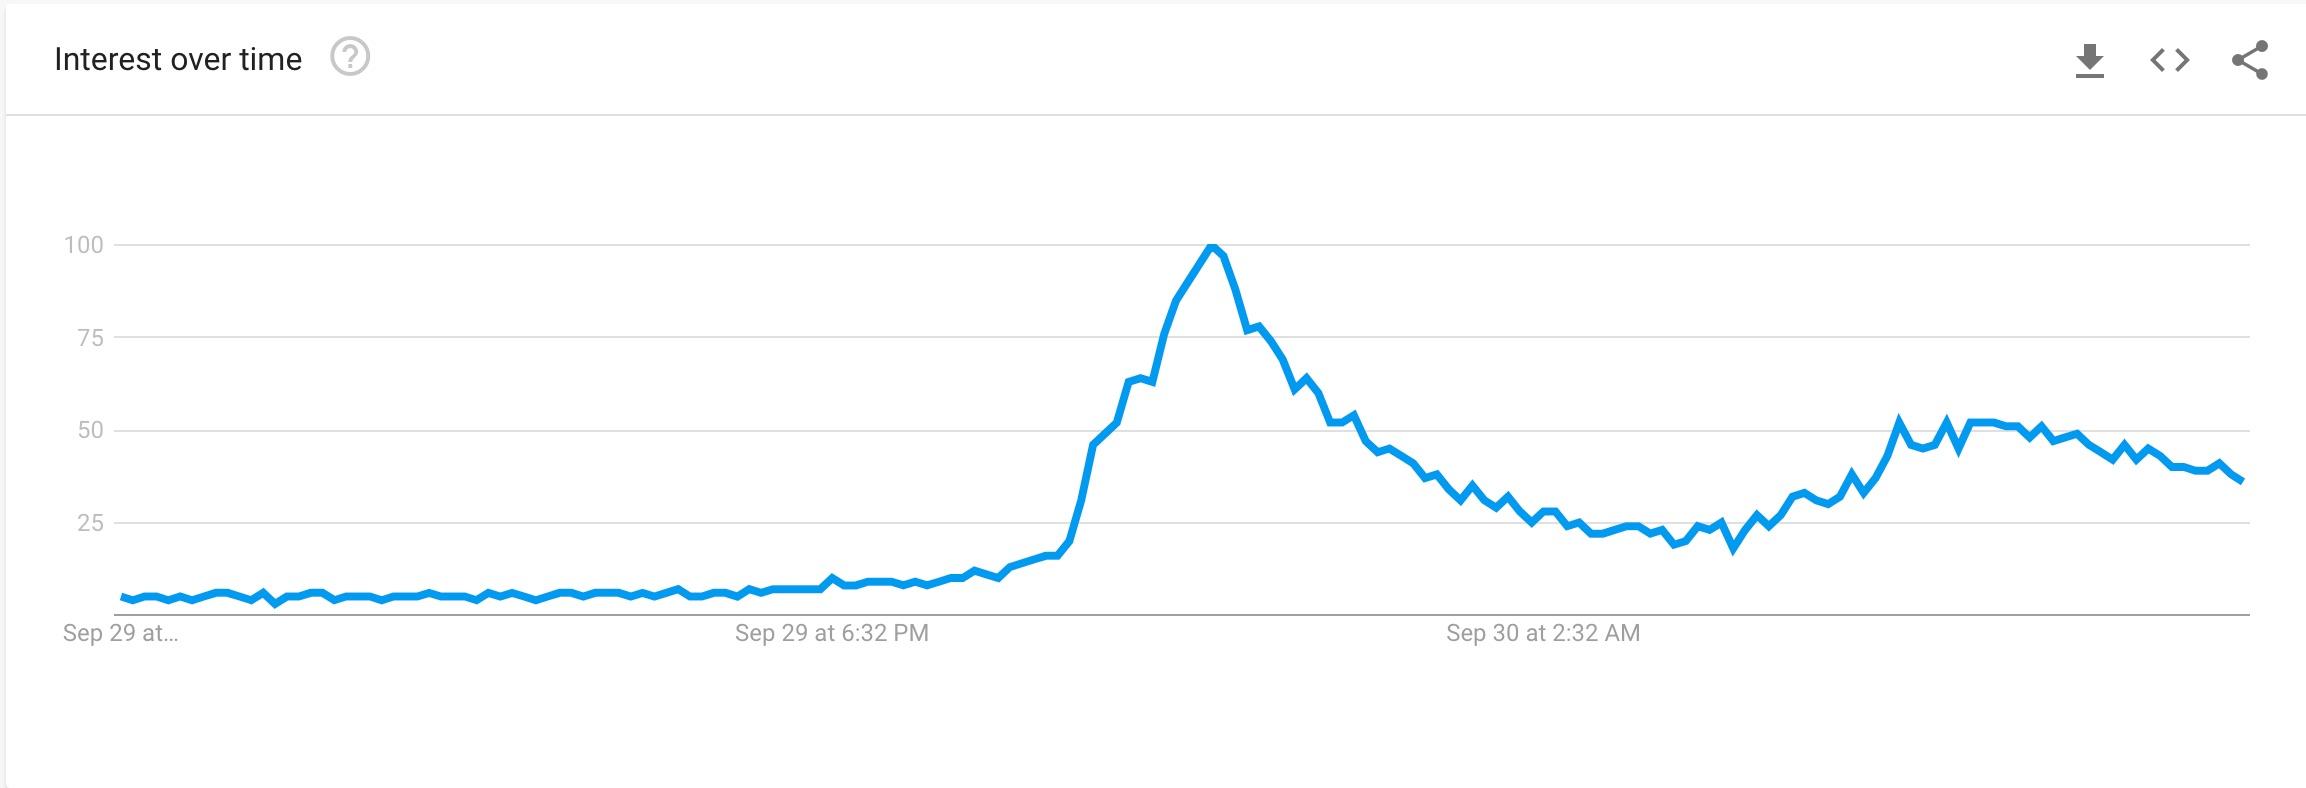 Jo Jorgensen Google Trends